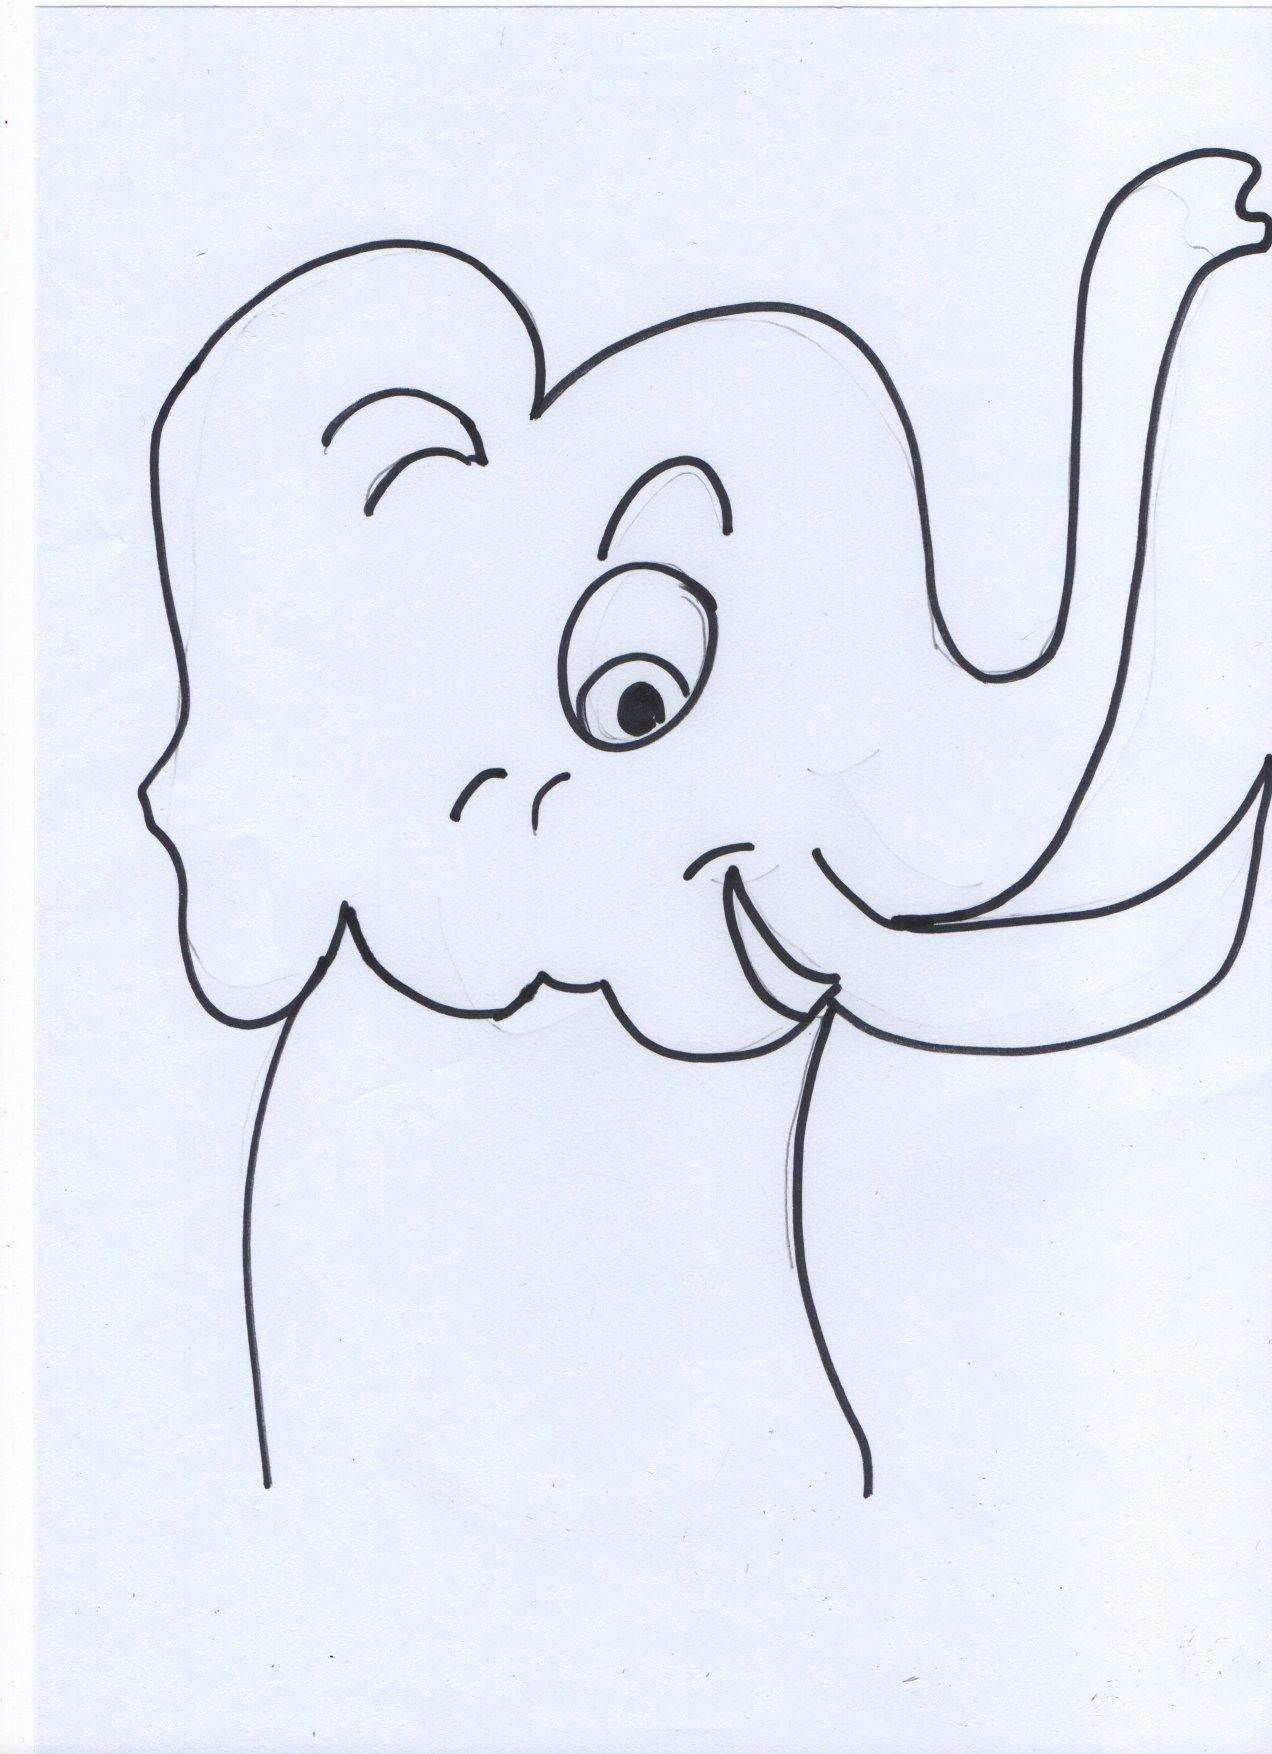 Zoo Animal Worksheet Middle School